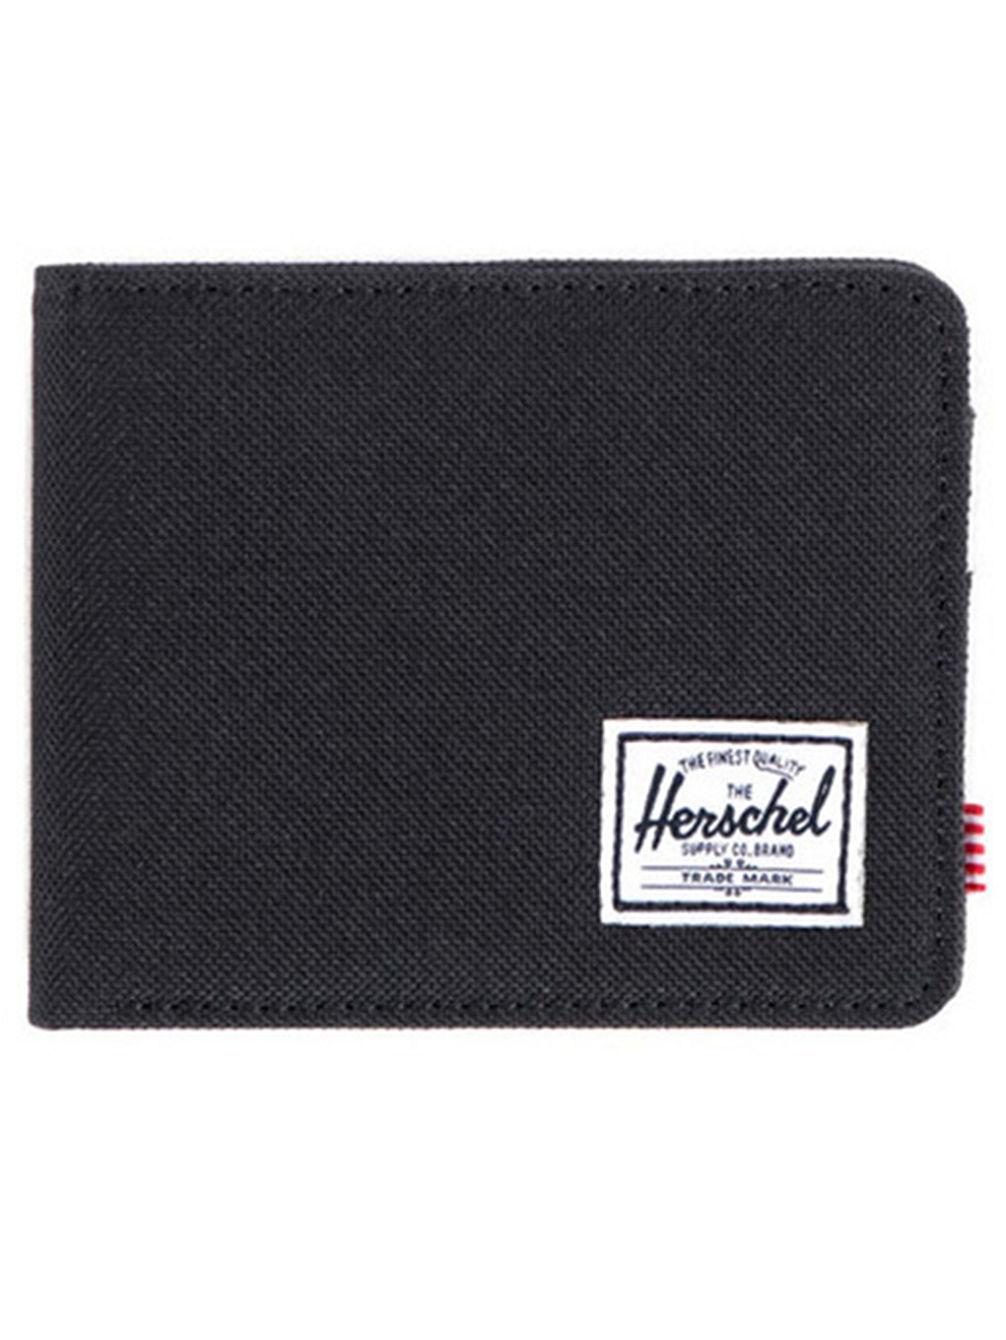 herschel-roy-coin-wallet